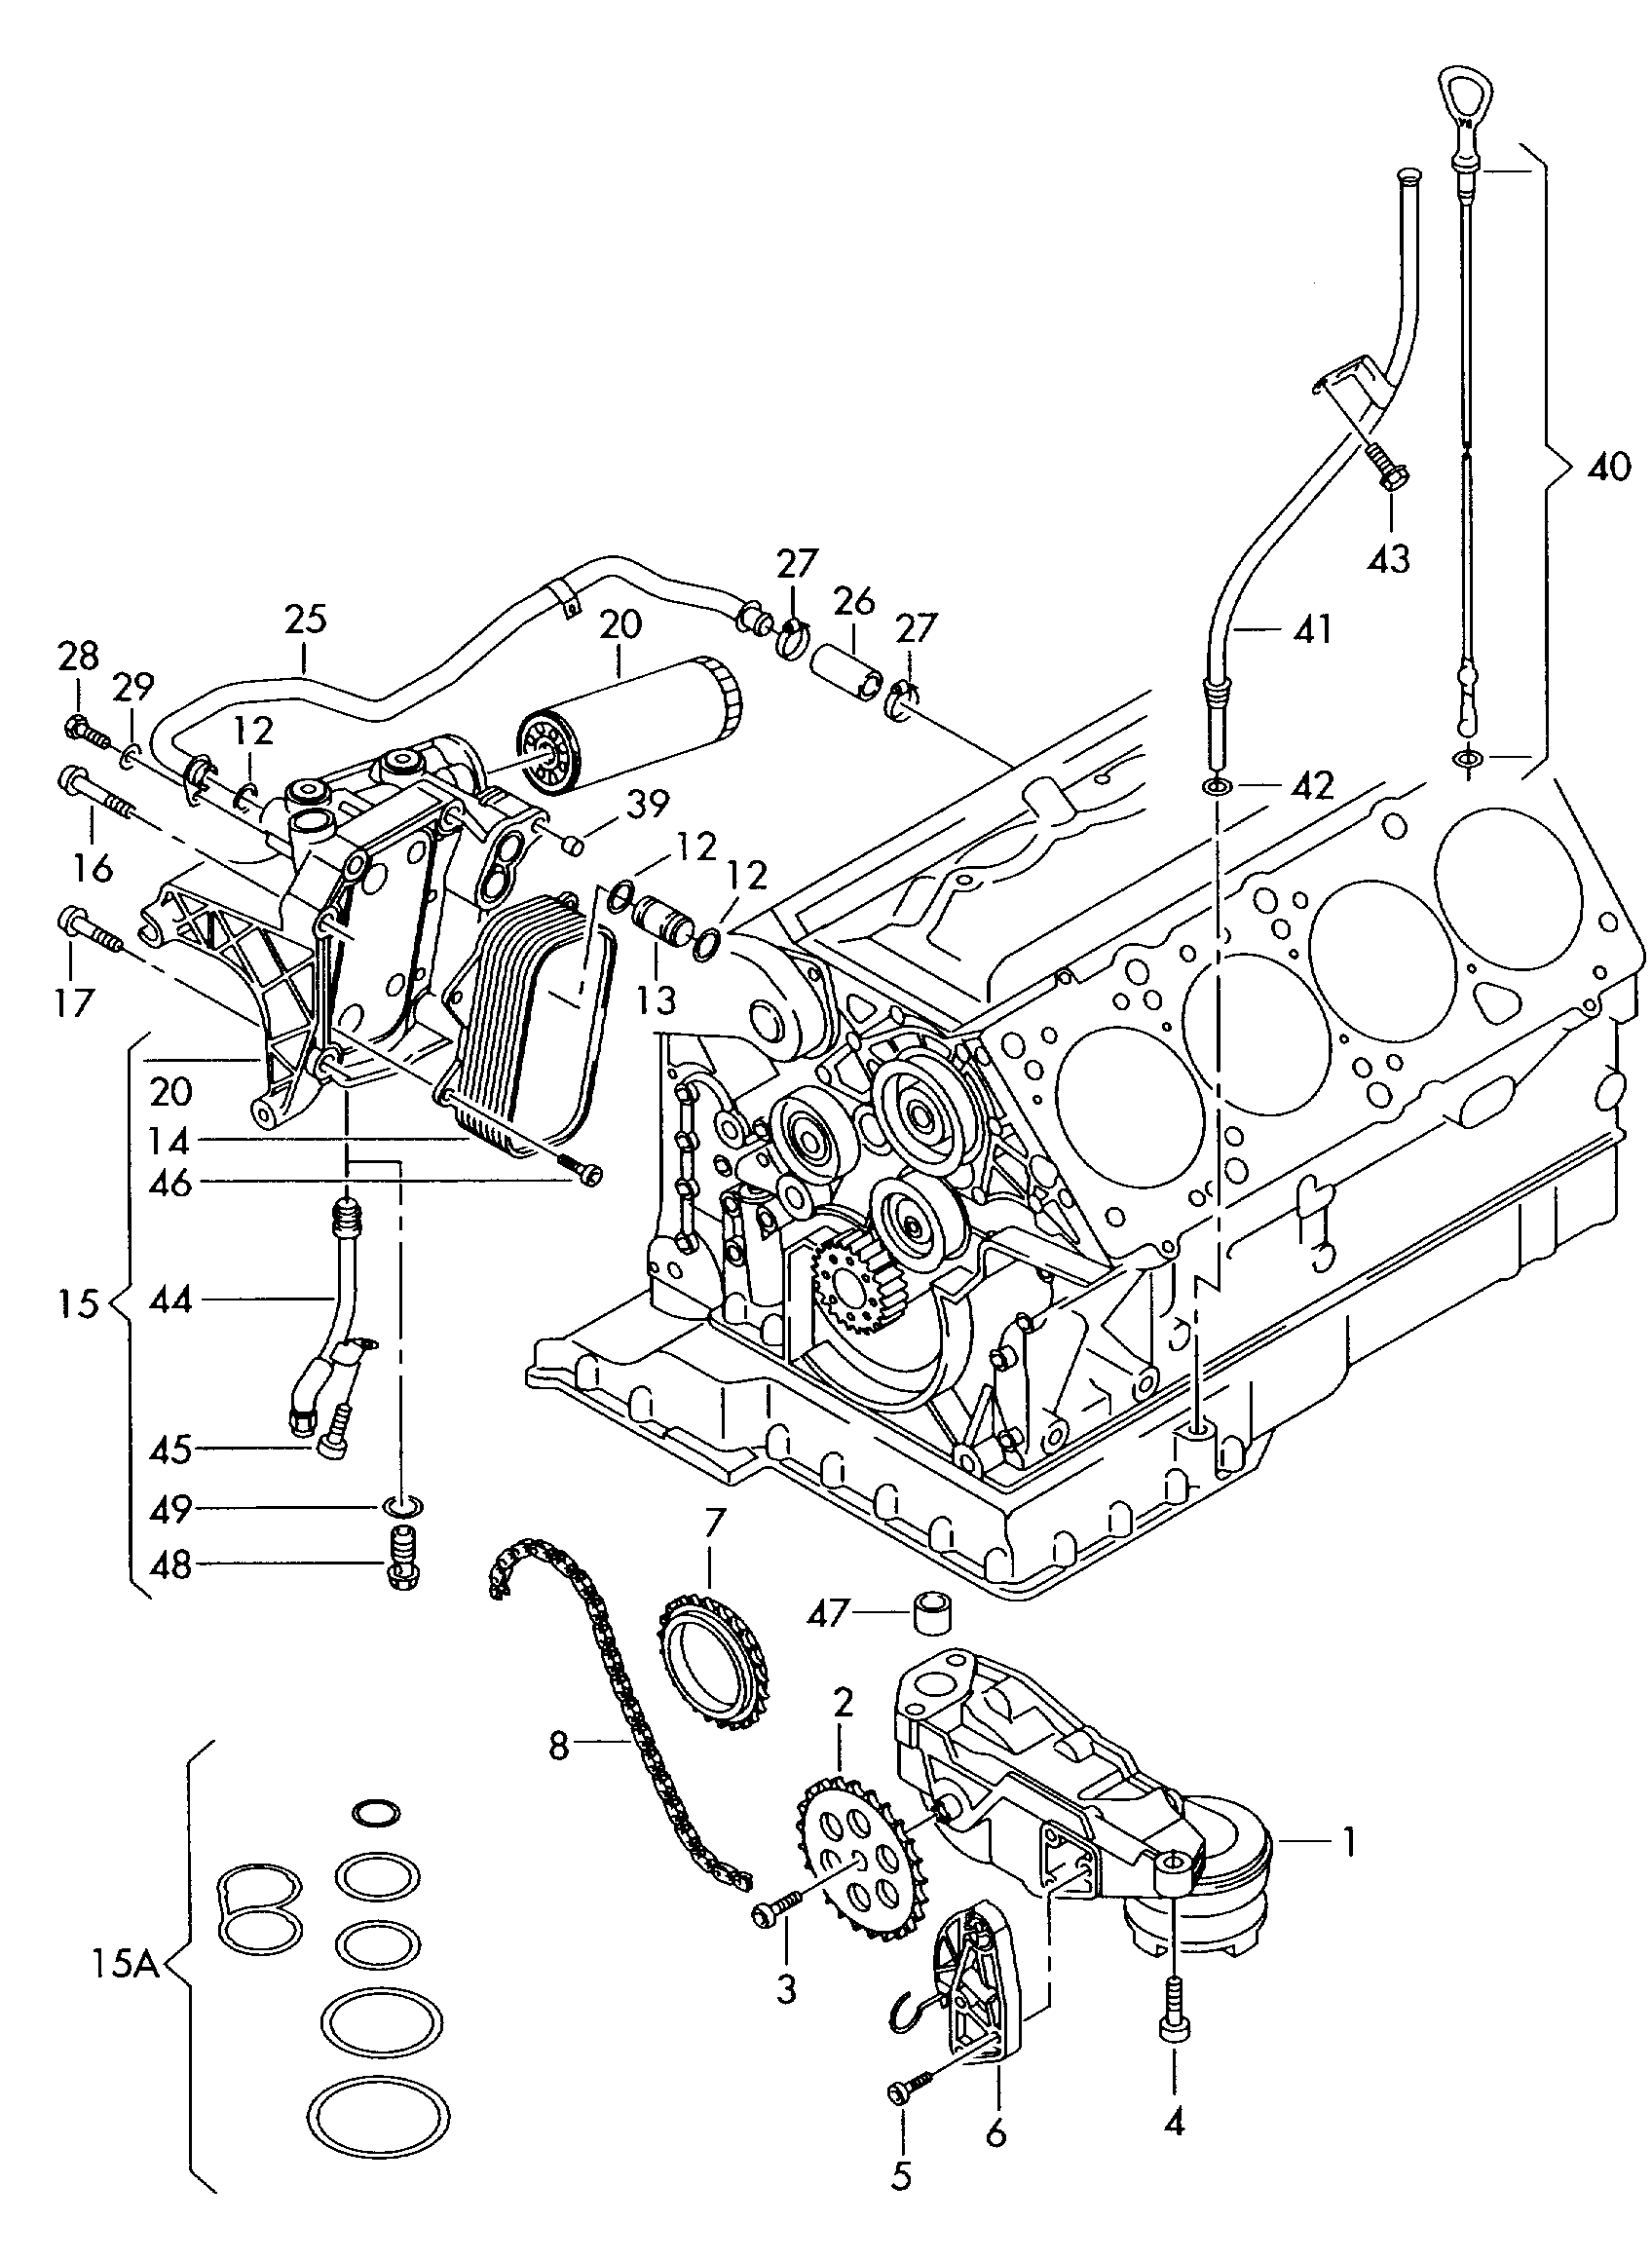 Engine Audi A6q Oil Pump Oil Filter Oil Filter